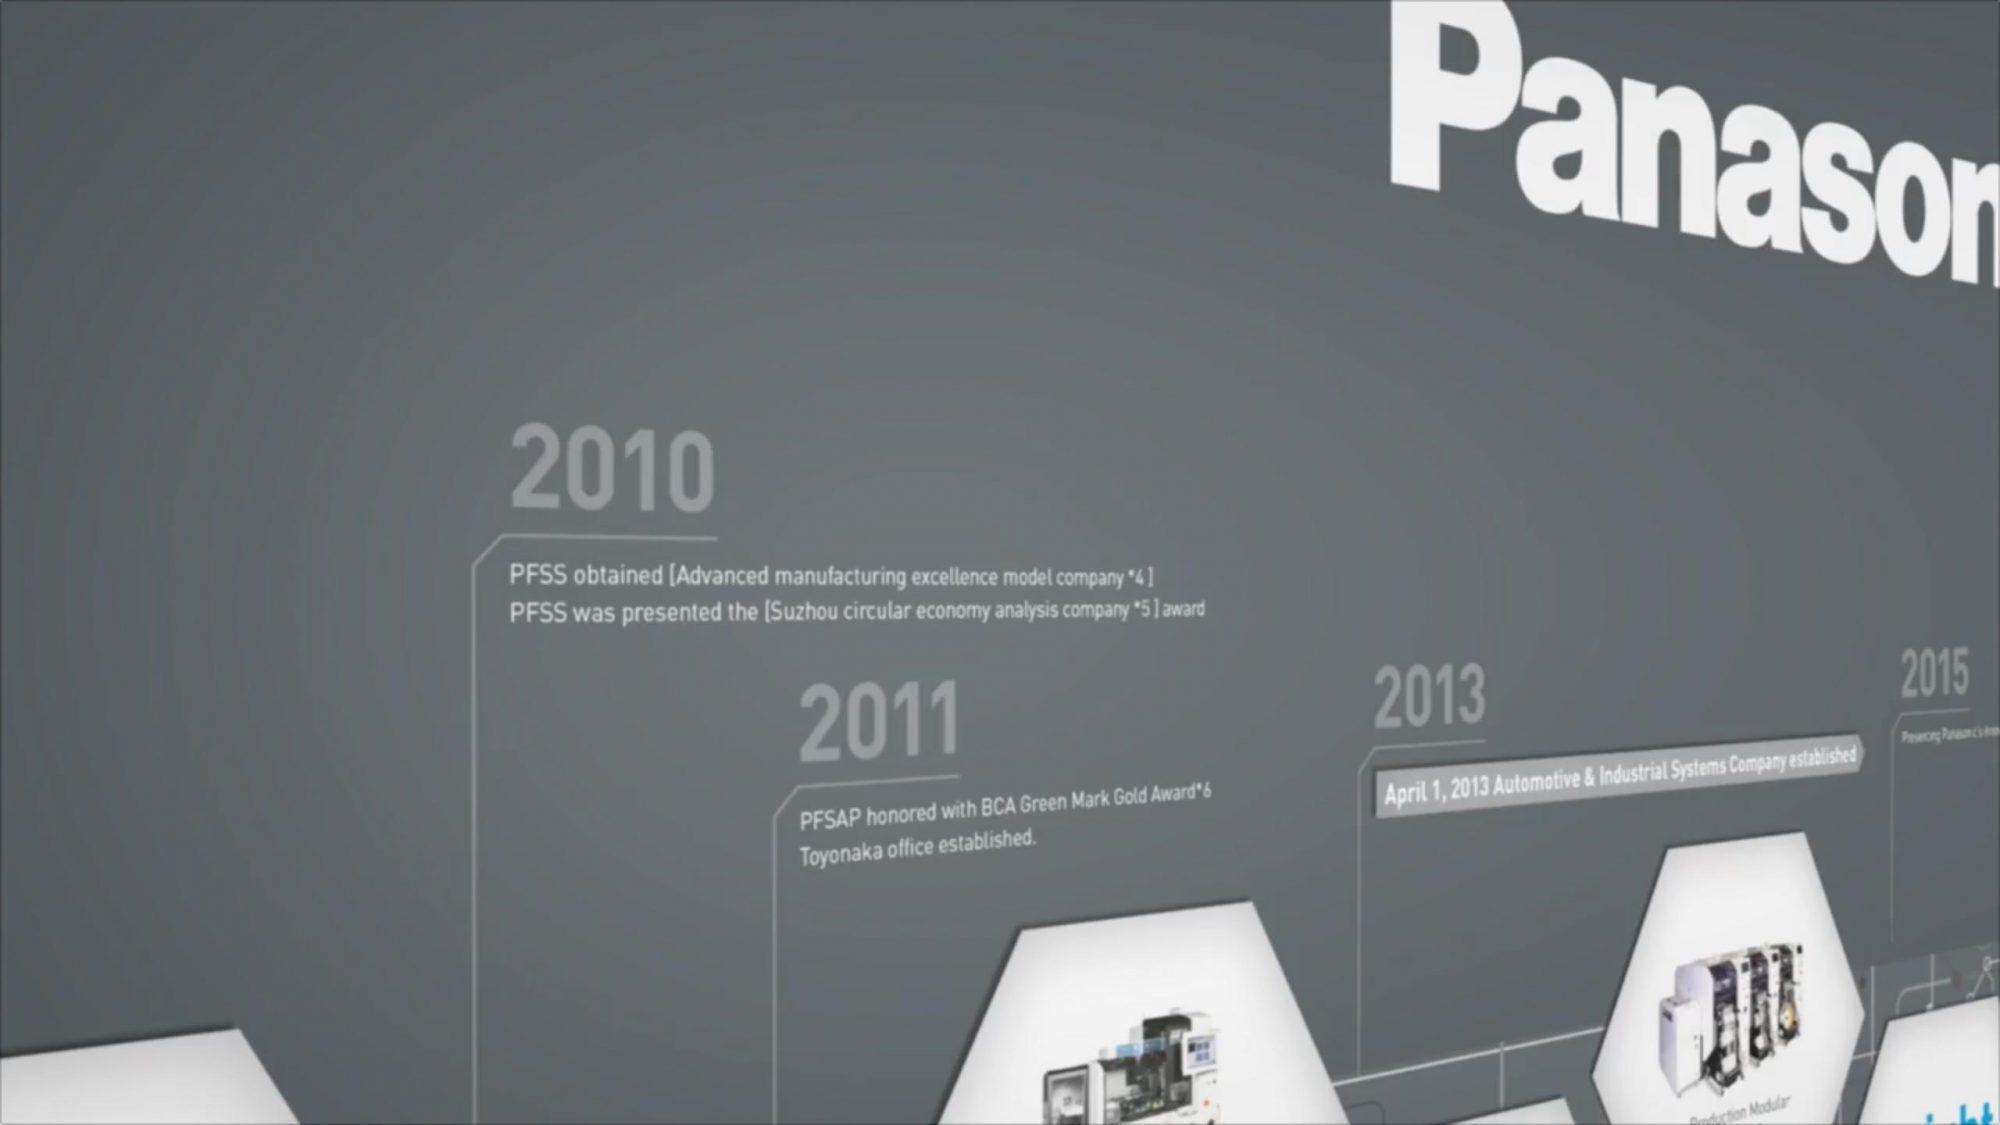 Panasonic Messe 3D Rendering und Foto